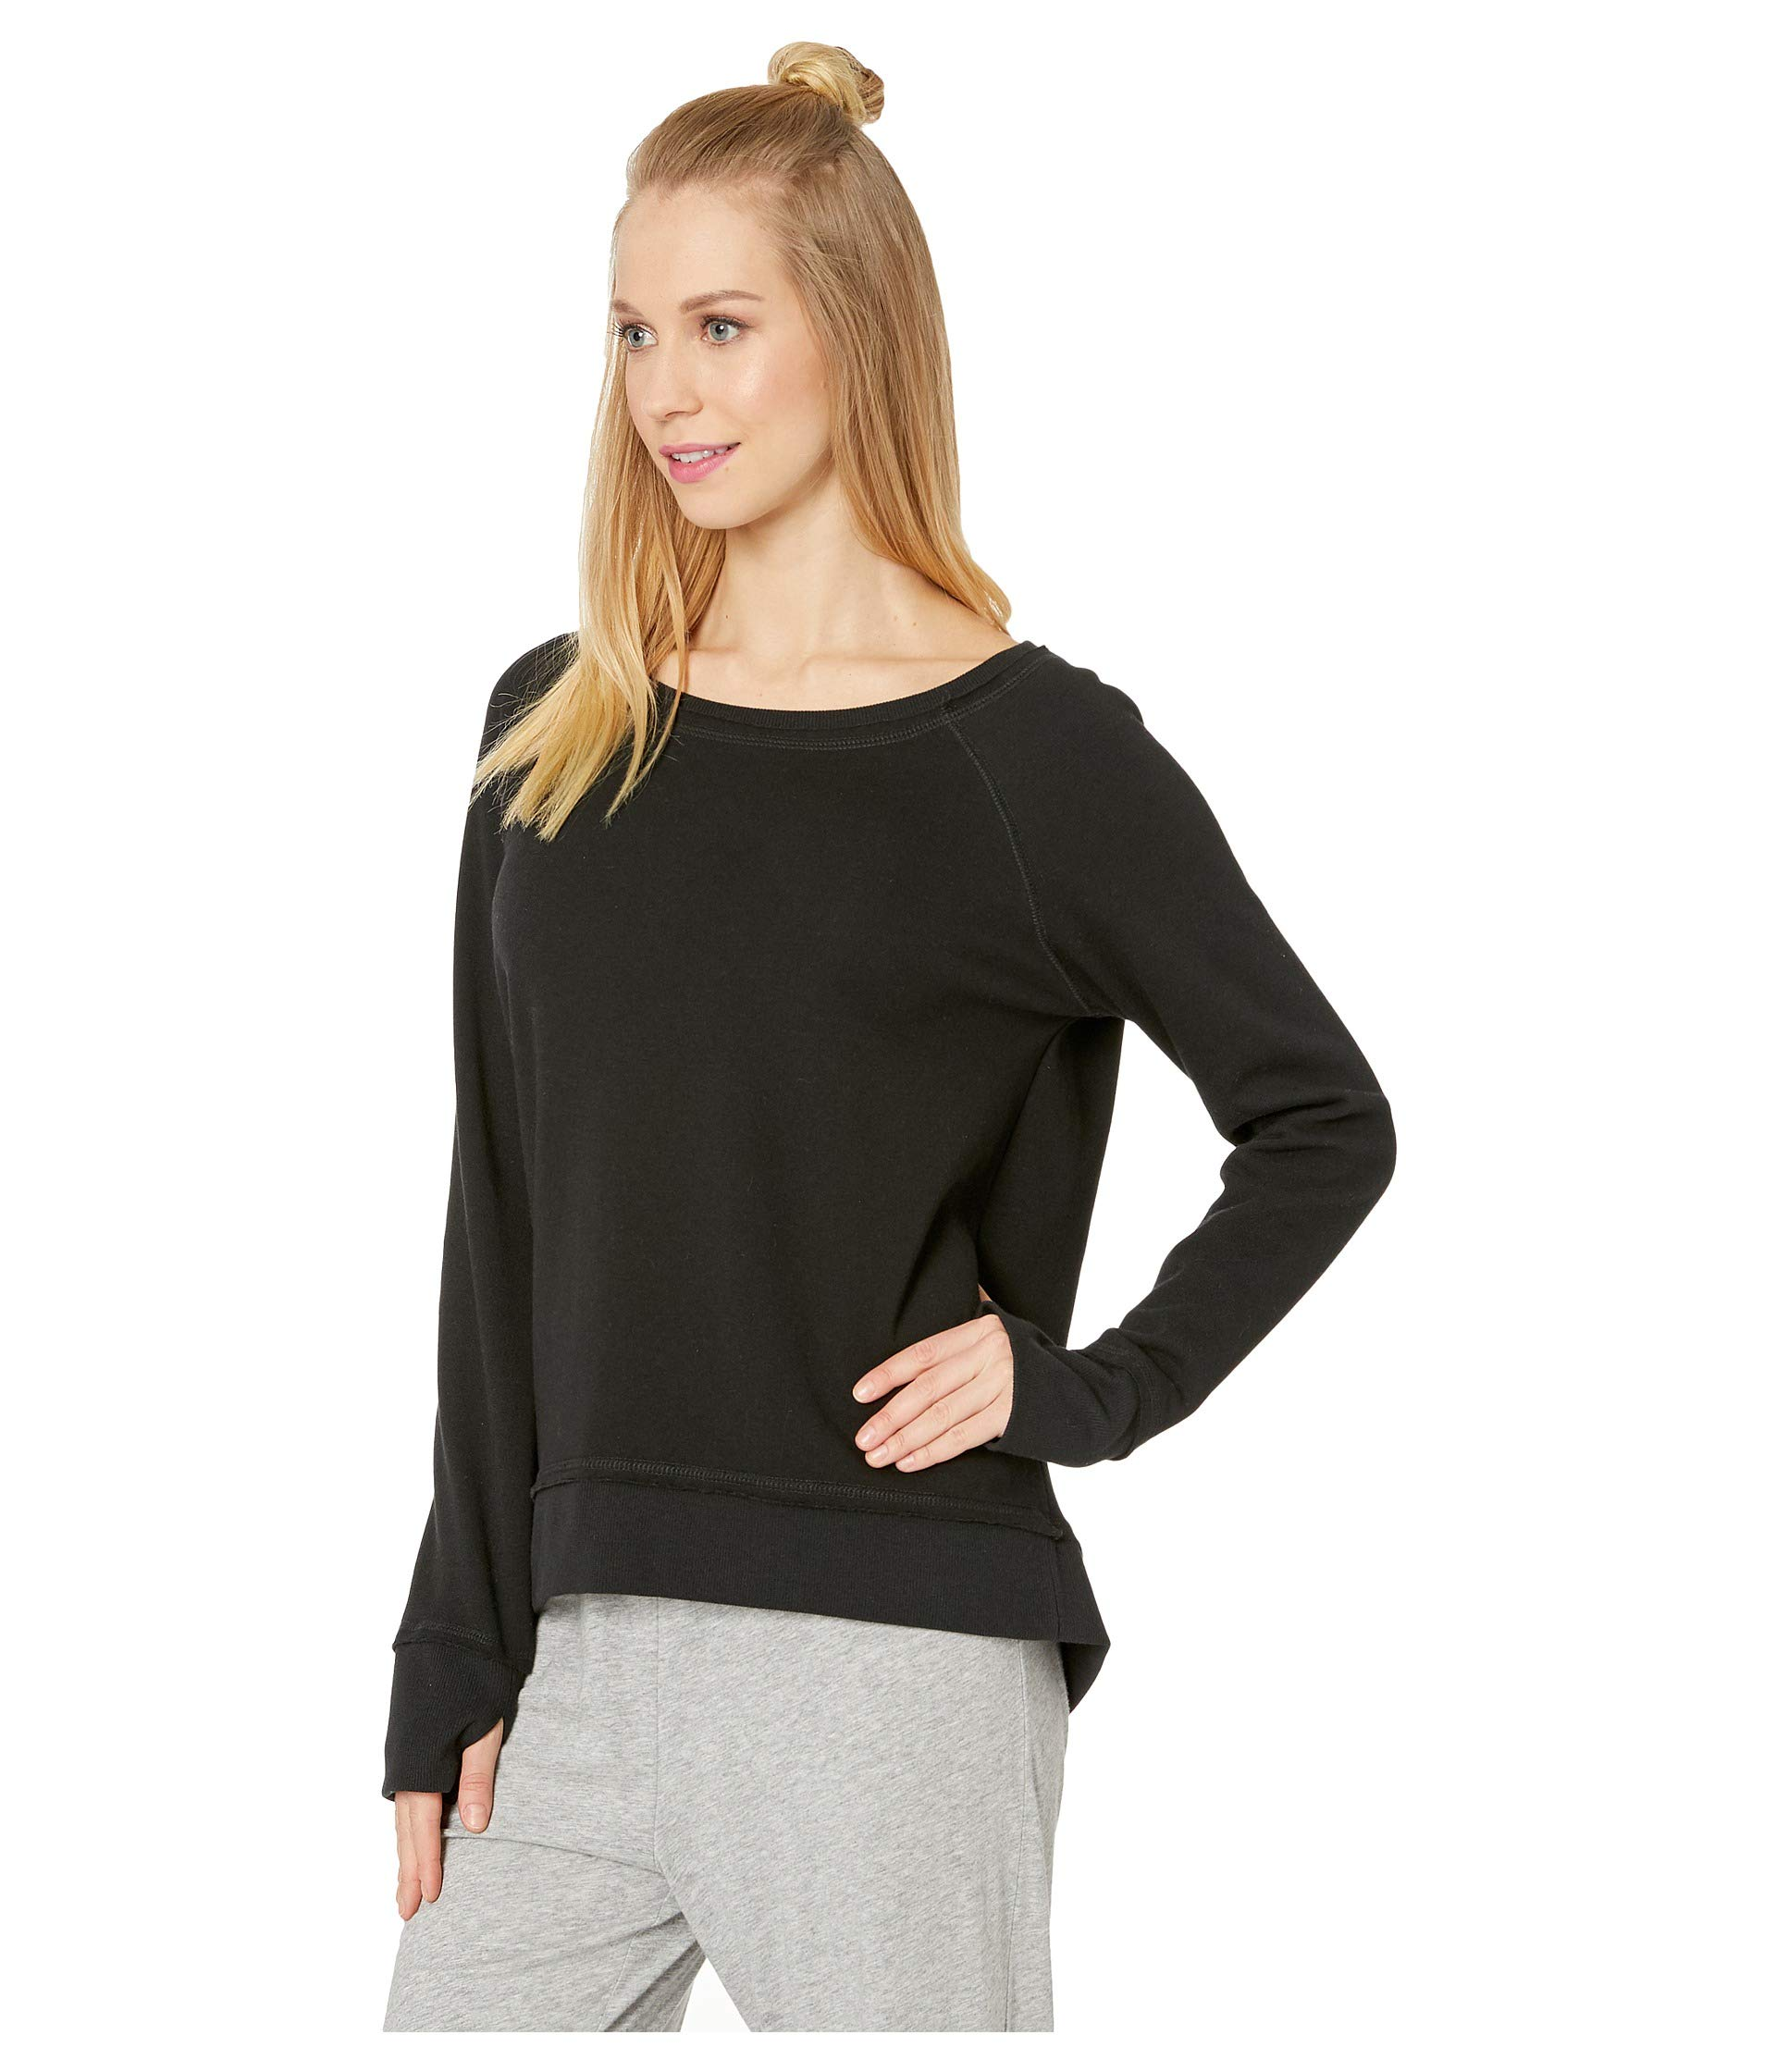 j Sweater Salvage Black Silky P Lounge vSZPfqA